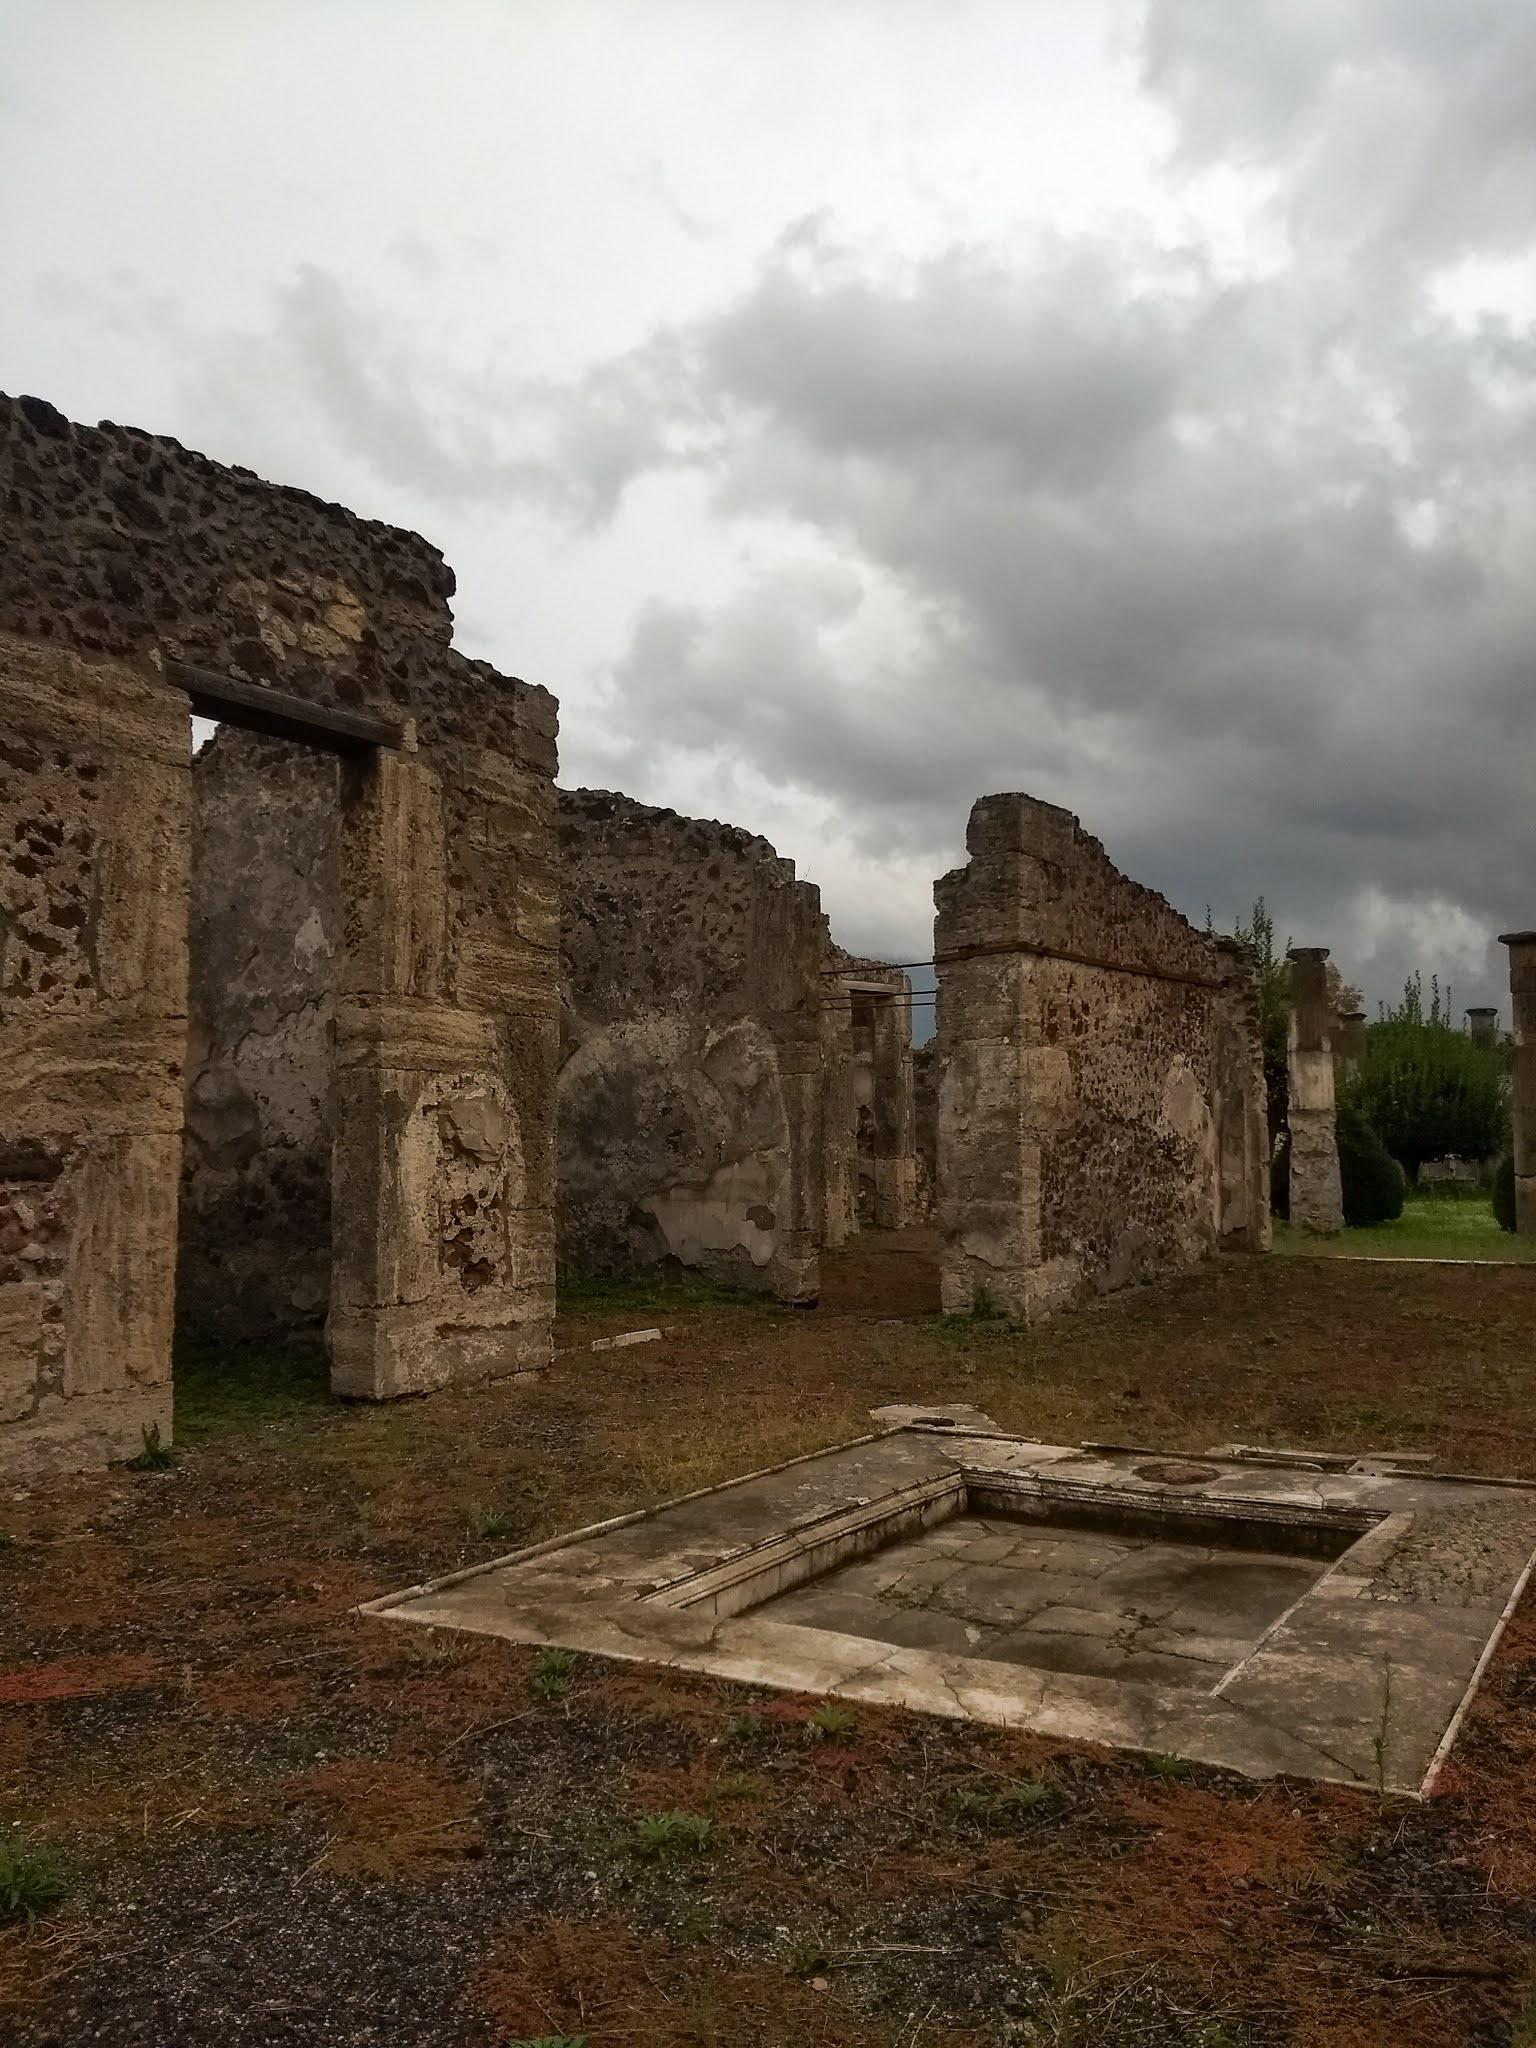 View of a pool in the atrium of Domus Cornelia, Pompeii, Italy.